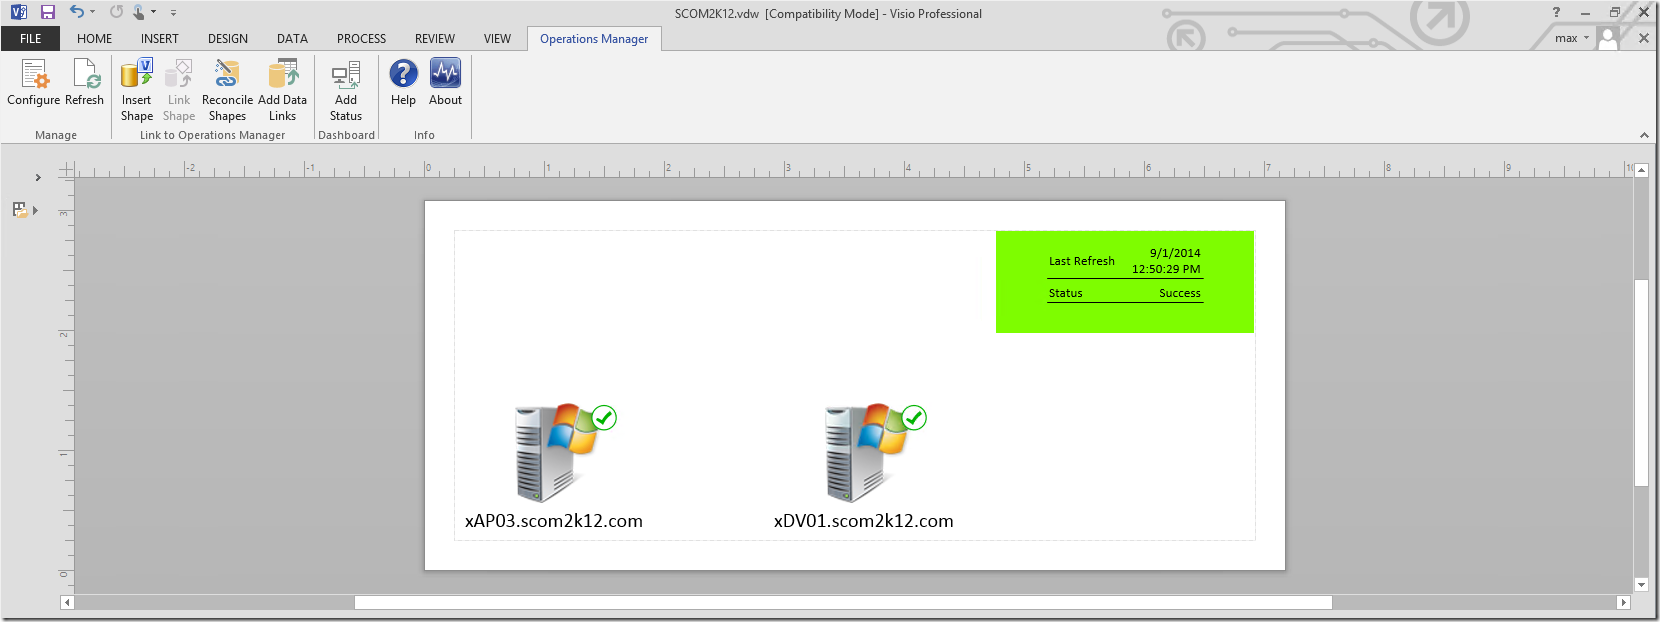 Installing SCOM 2012 Visio Dashboards in SharePoint 2013